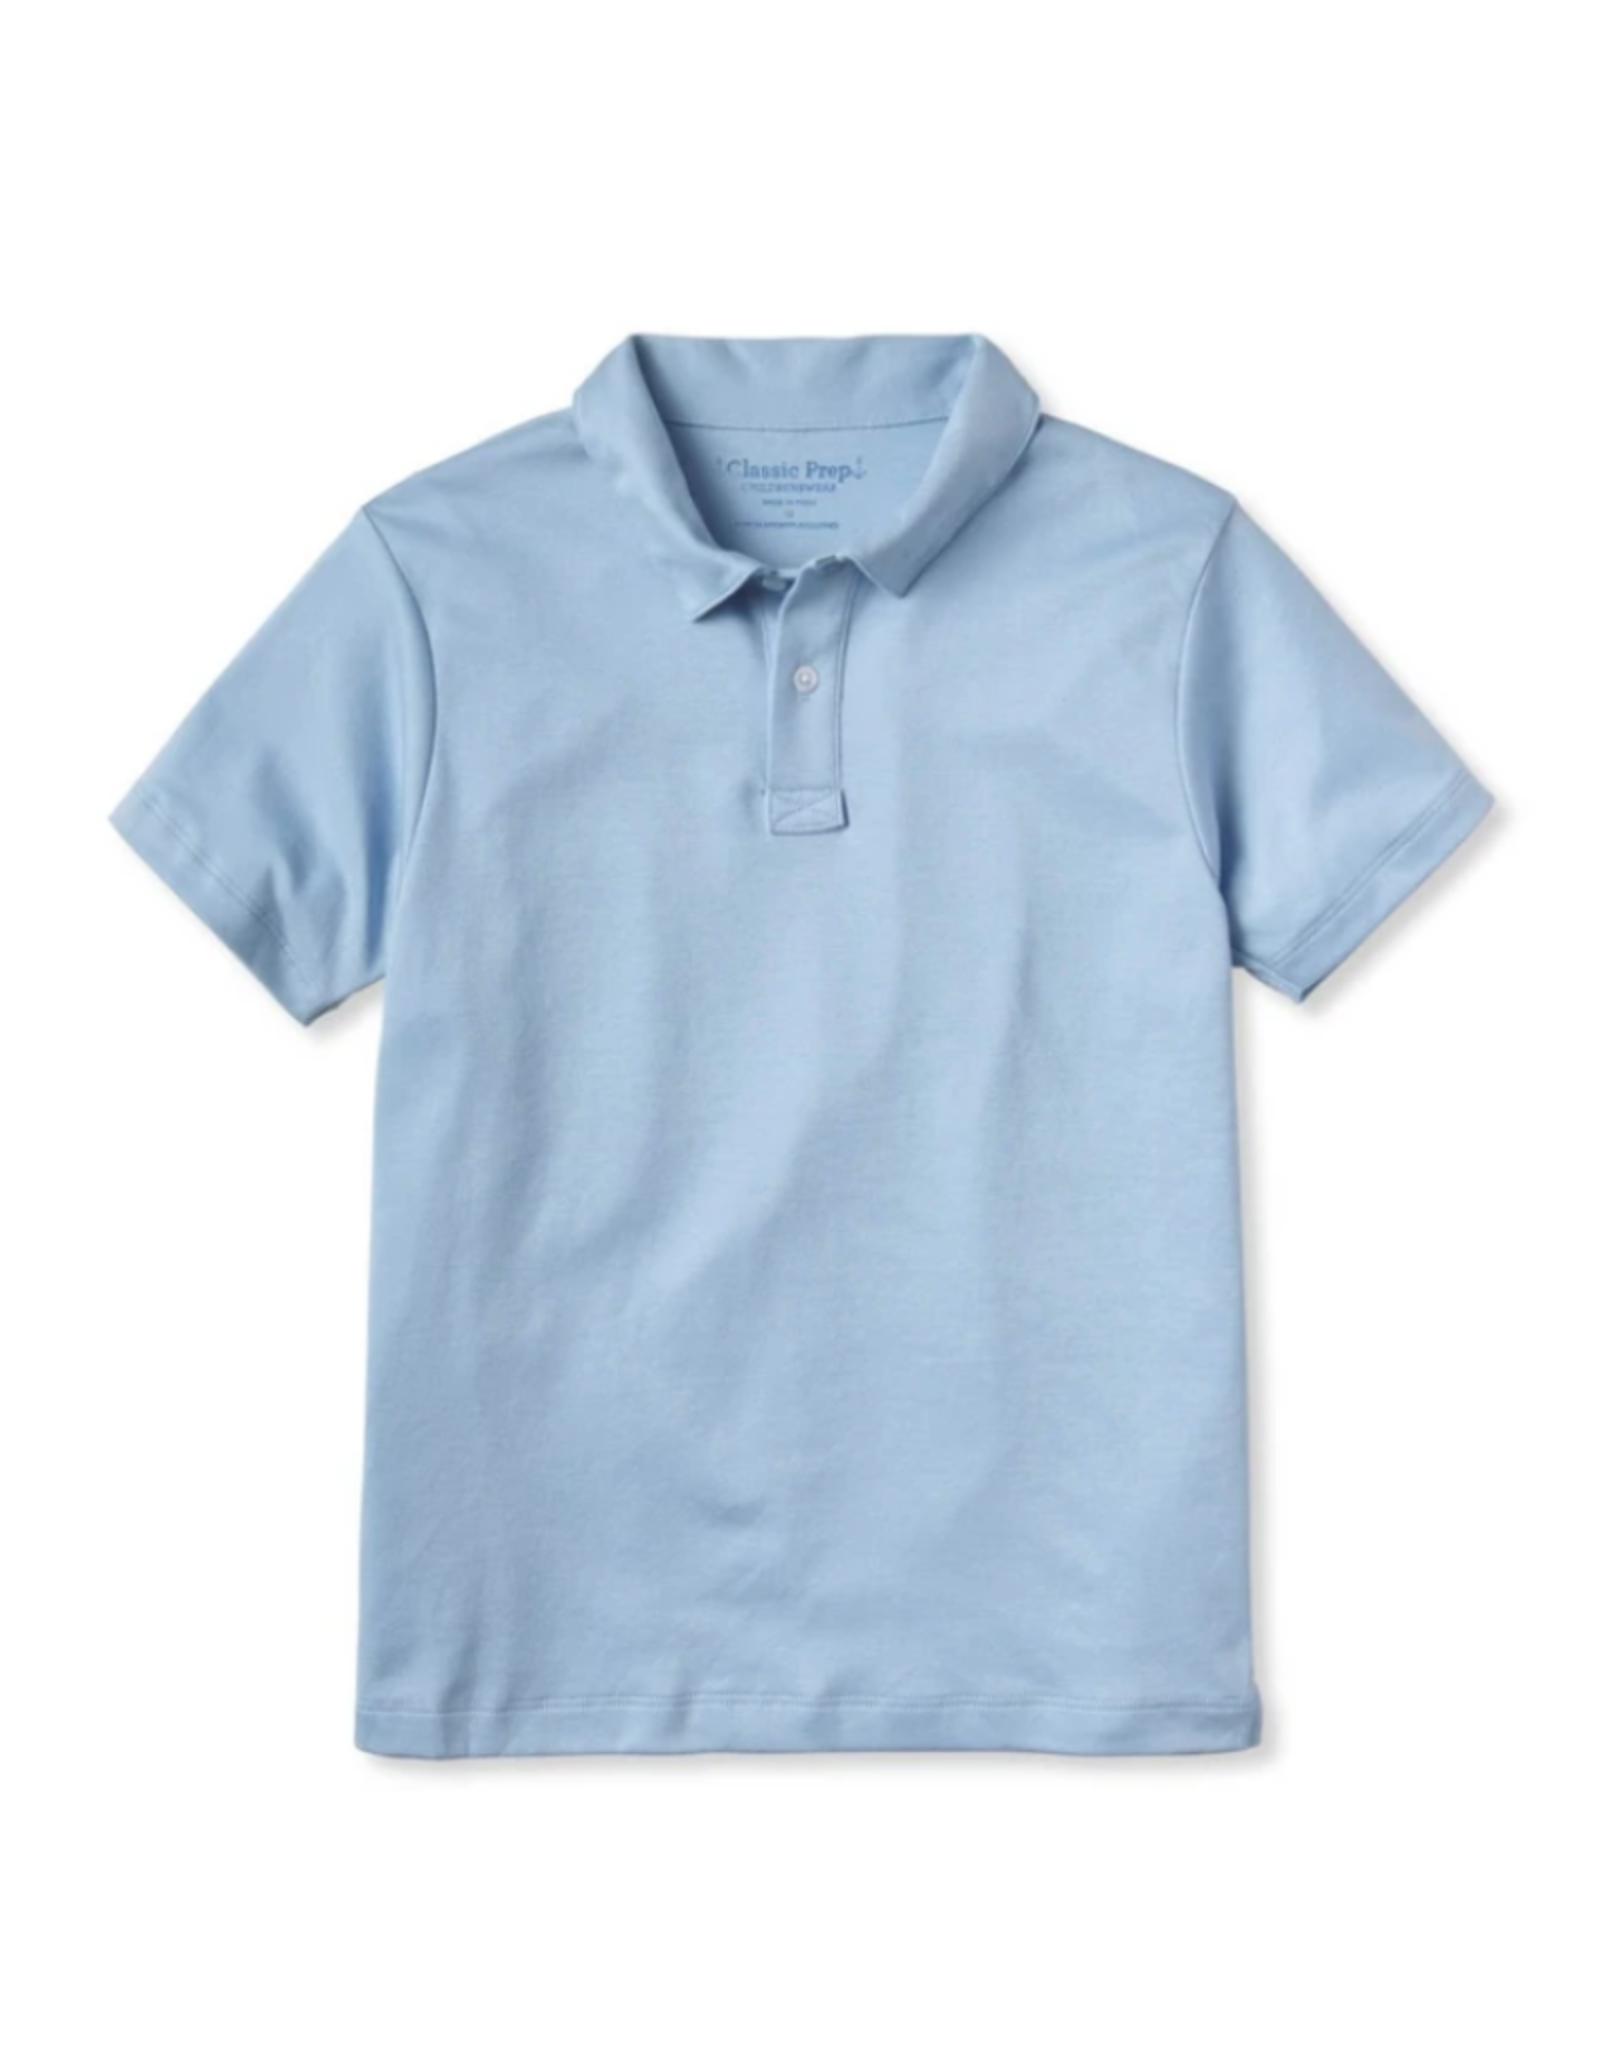 Classic prep Henry Blue Short Sleeve Polo